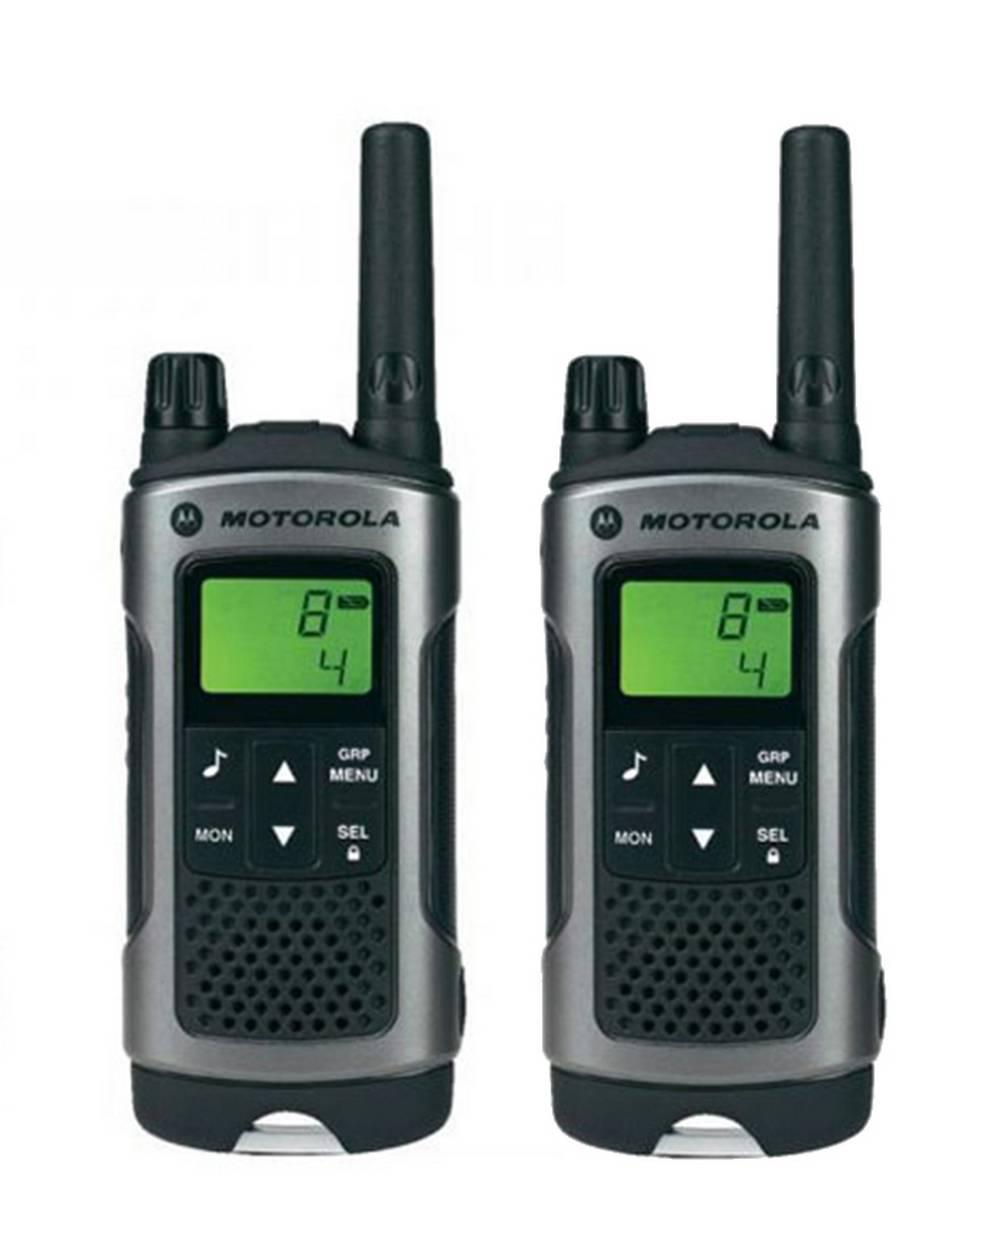 Walkie Talkie Motorola PMR T80 Μαύρο με Φακό Led και Υποδοχή Hands Free   Εύρος Κάλυψης 10 km